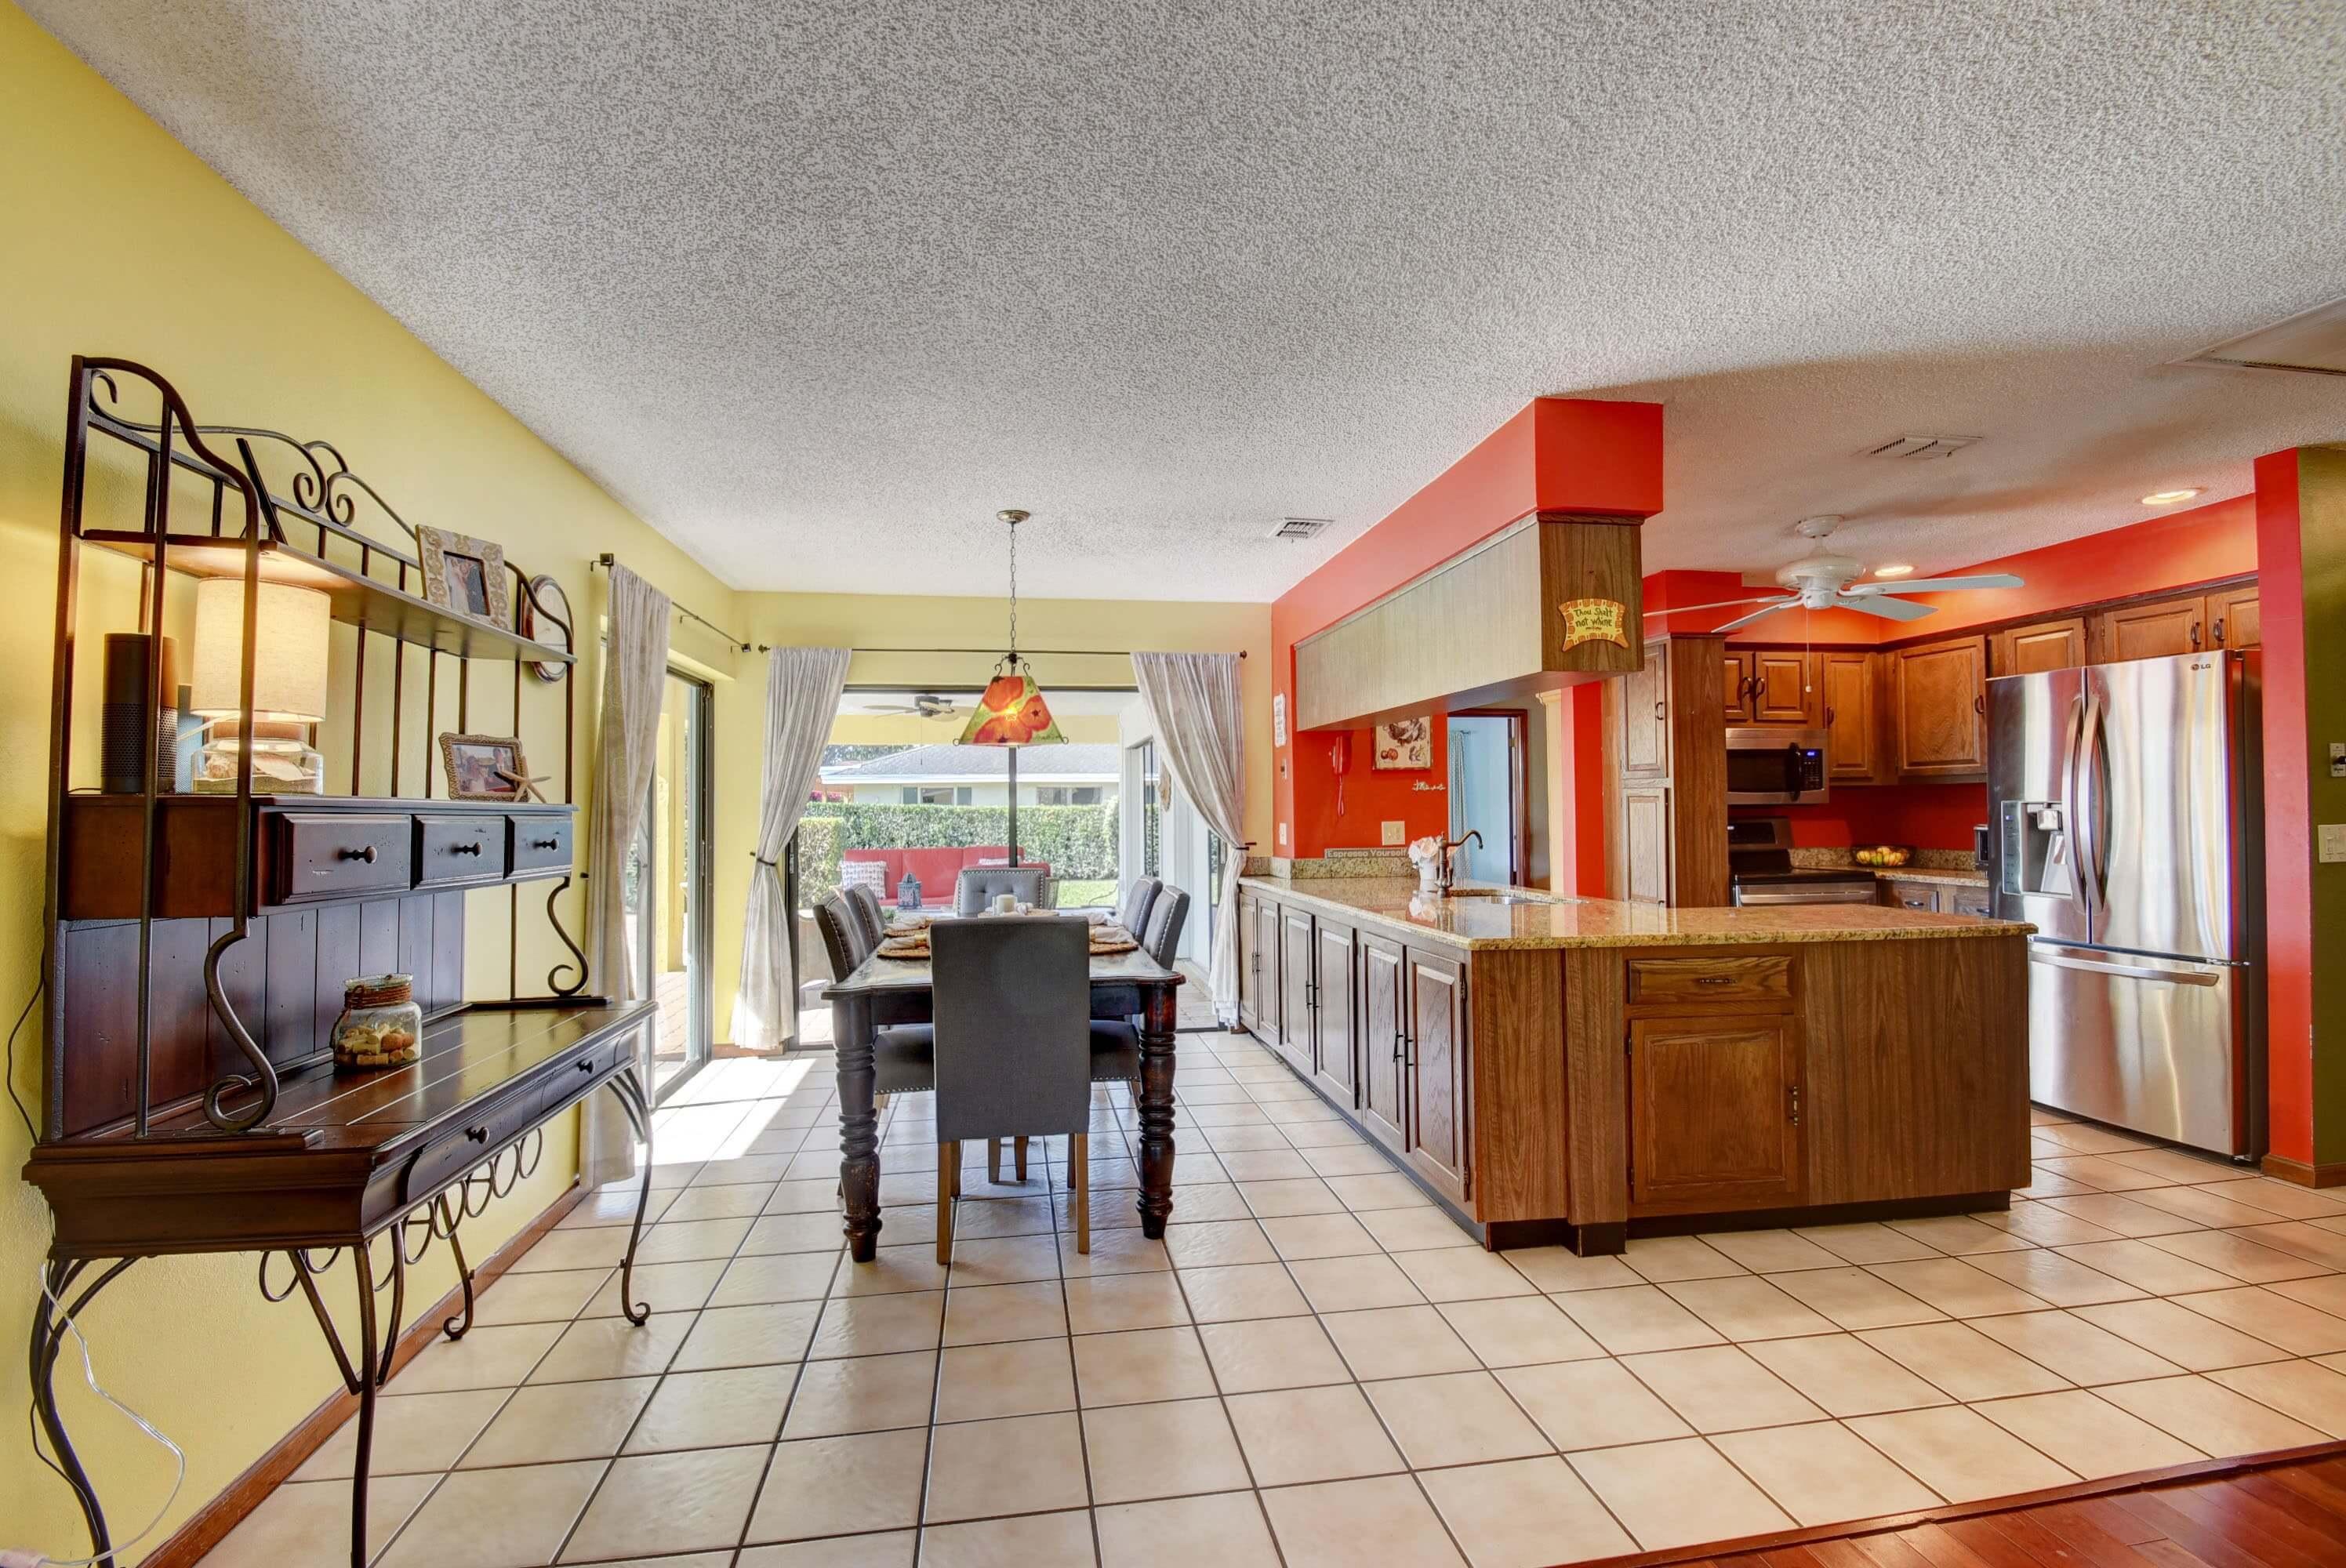 1654 The 12th Fairway Wellington FL Home for Sale